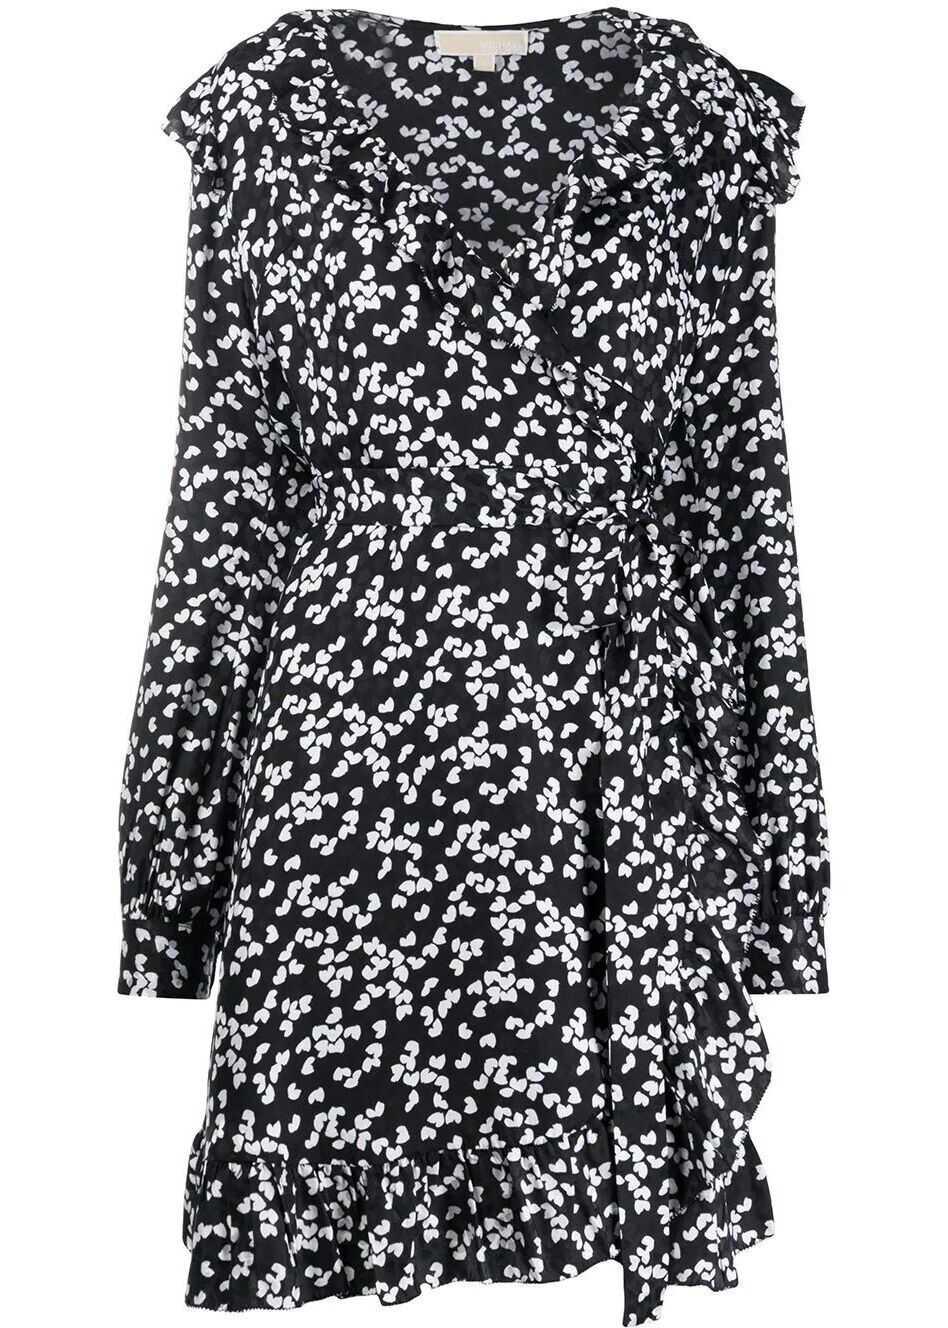 Michael Kors Silk Dress BLACK